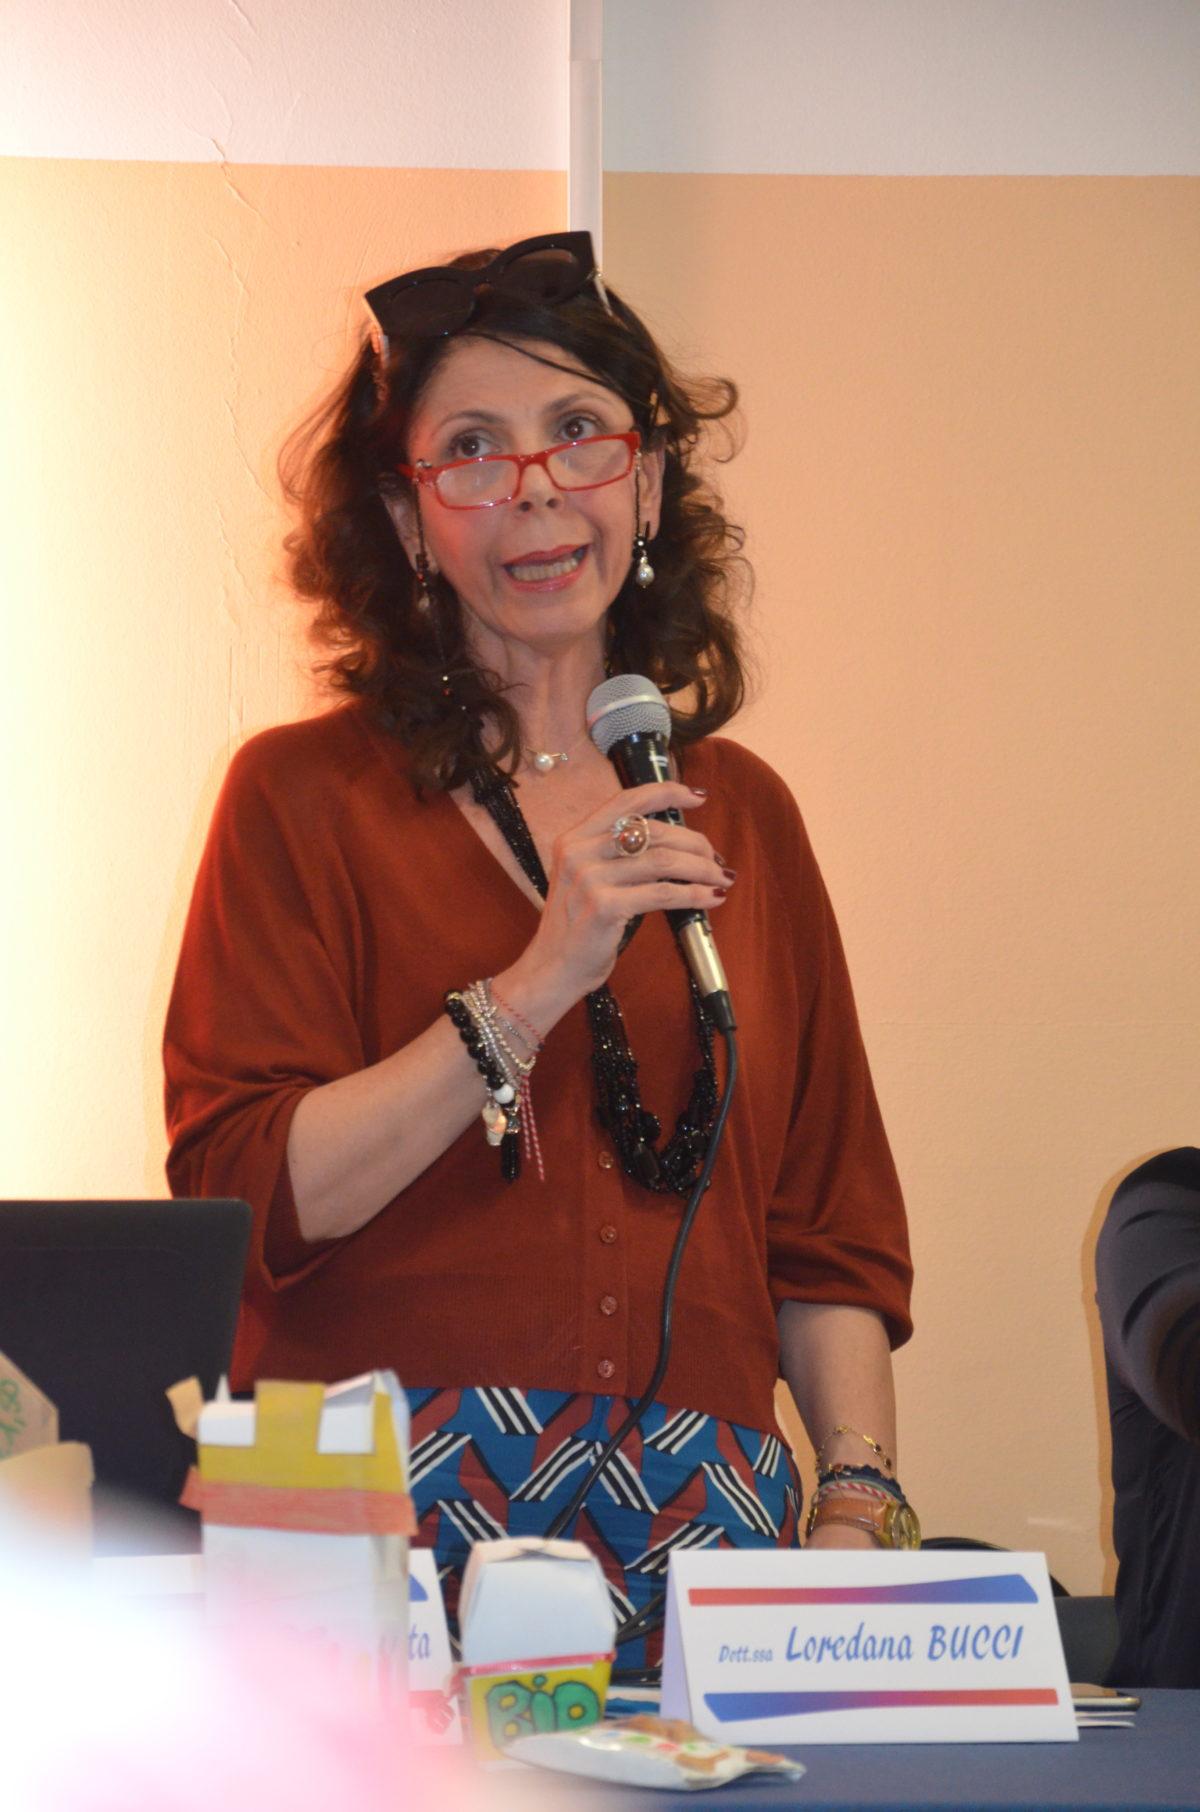 "The speech of the Headmaster ""Loredana Bucci"" of the I.C. Renato Moro at the final meeting of the Erasmus + G.R.E.E.N. in Europe"